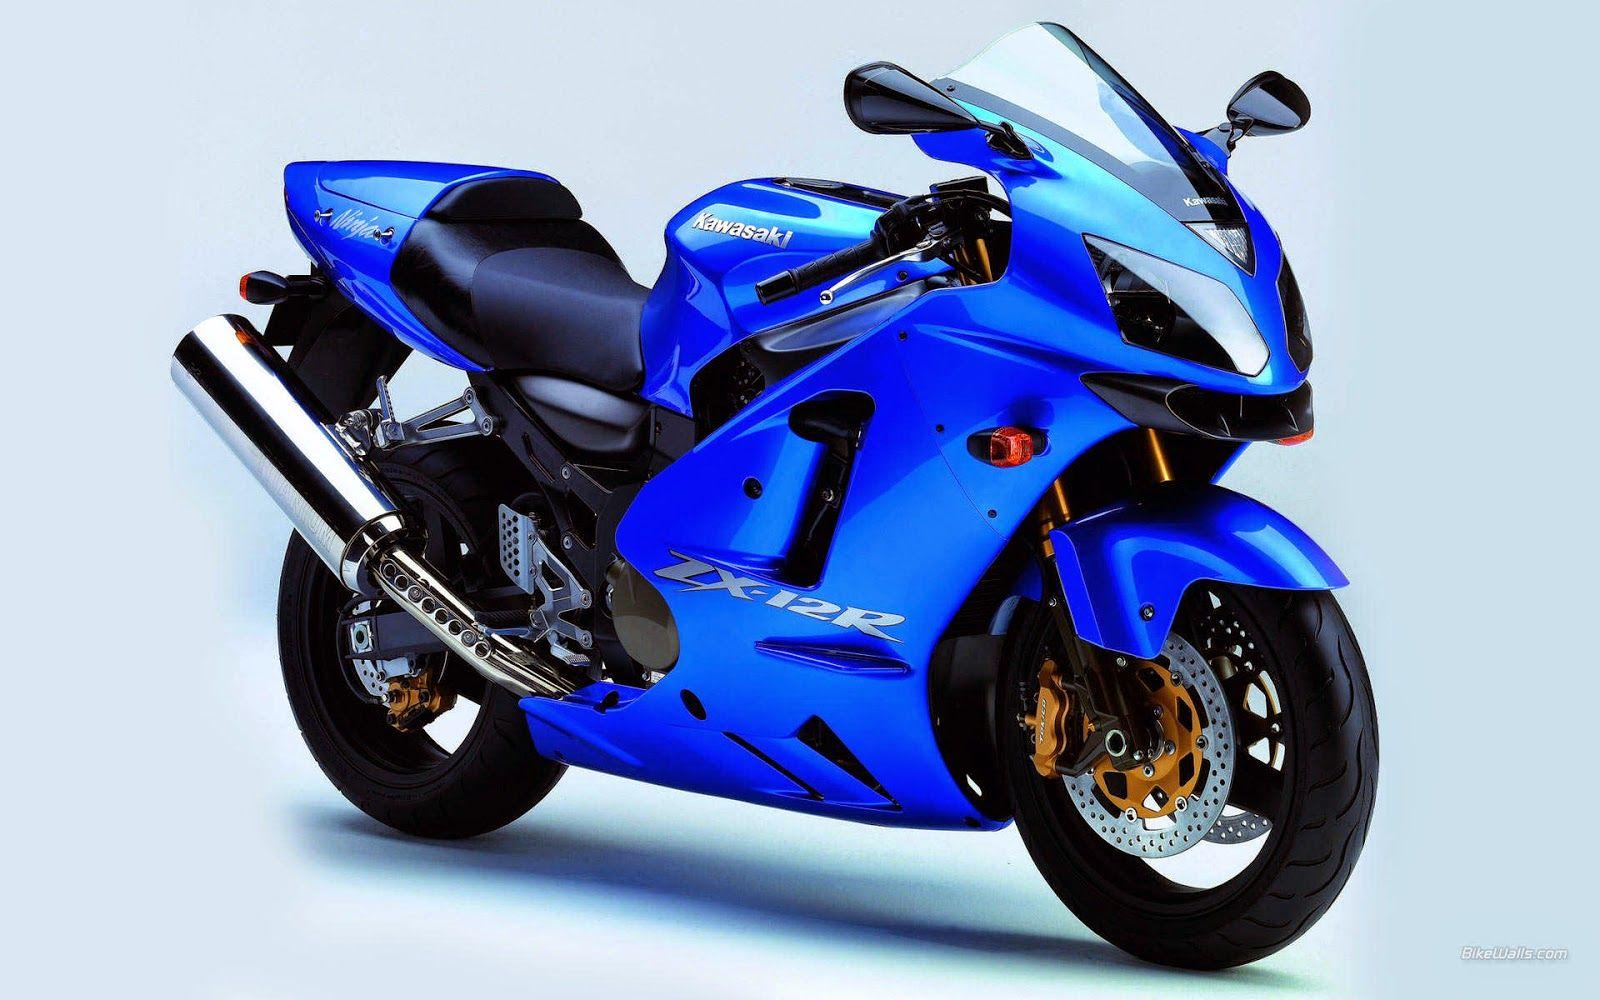 87 Gambar Motor Keren Kawasaki Terbaru Dan Terlengkap Tales Modif